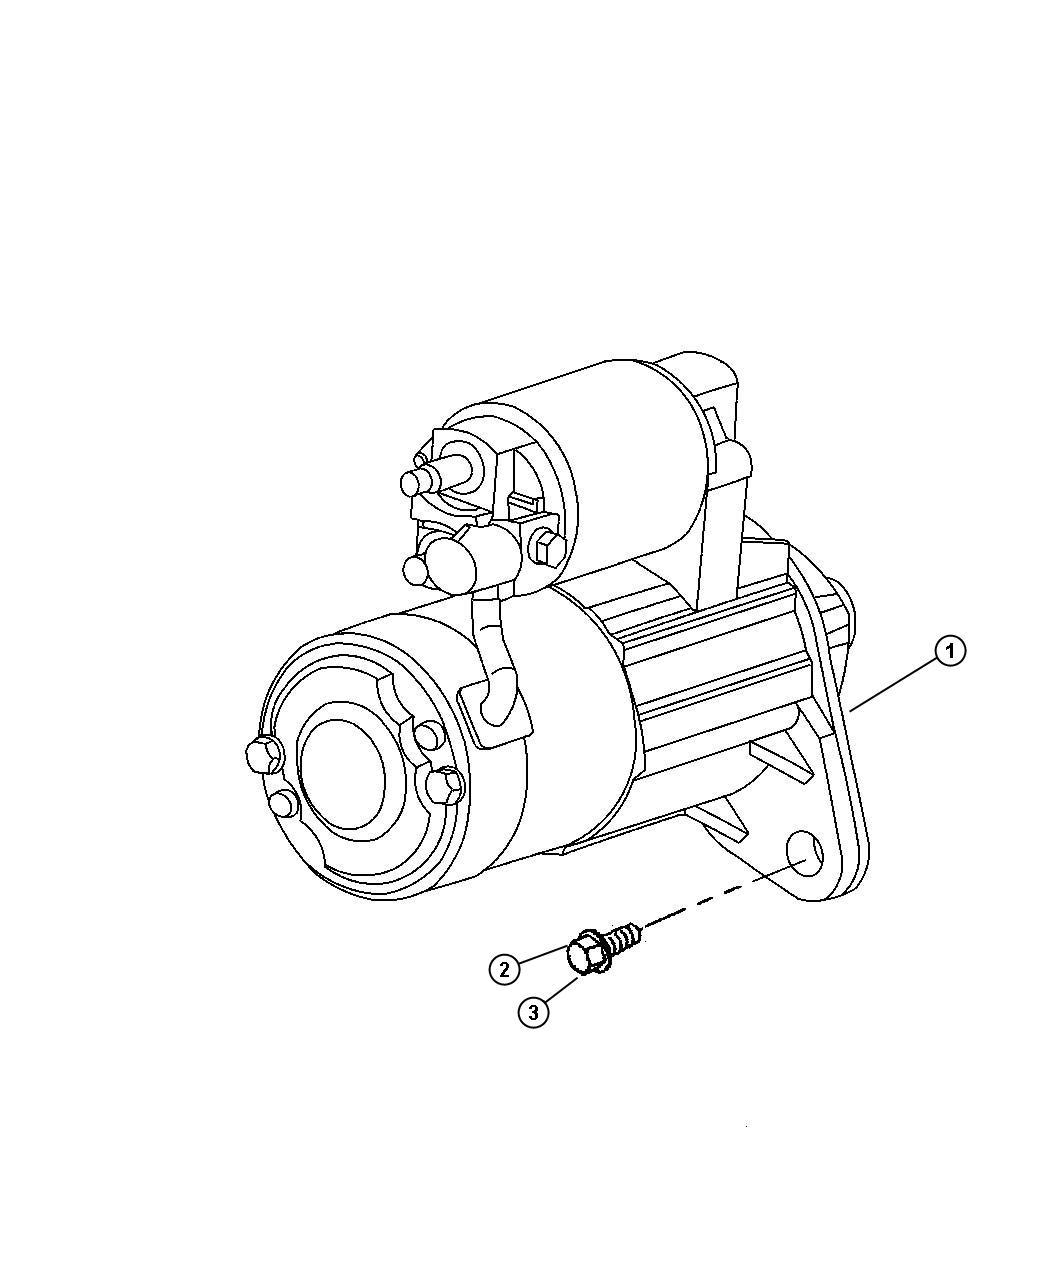 Dodge Grand Caravan Starter Engine Remanufactured